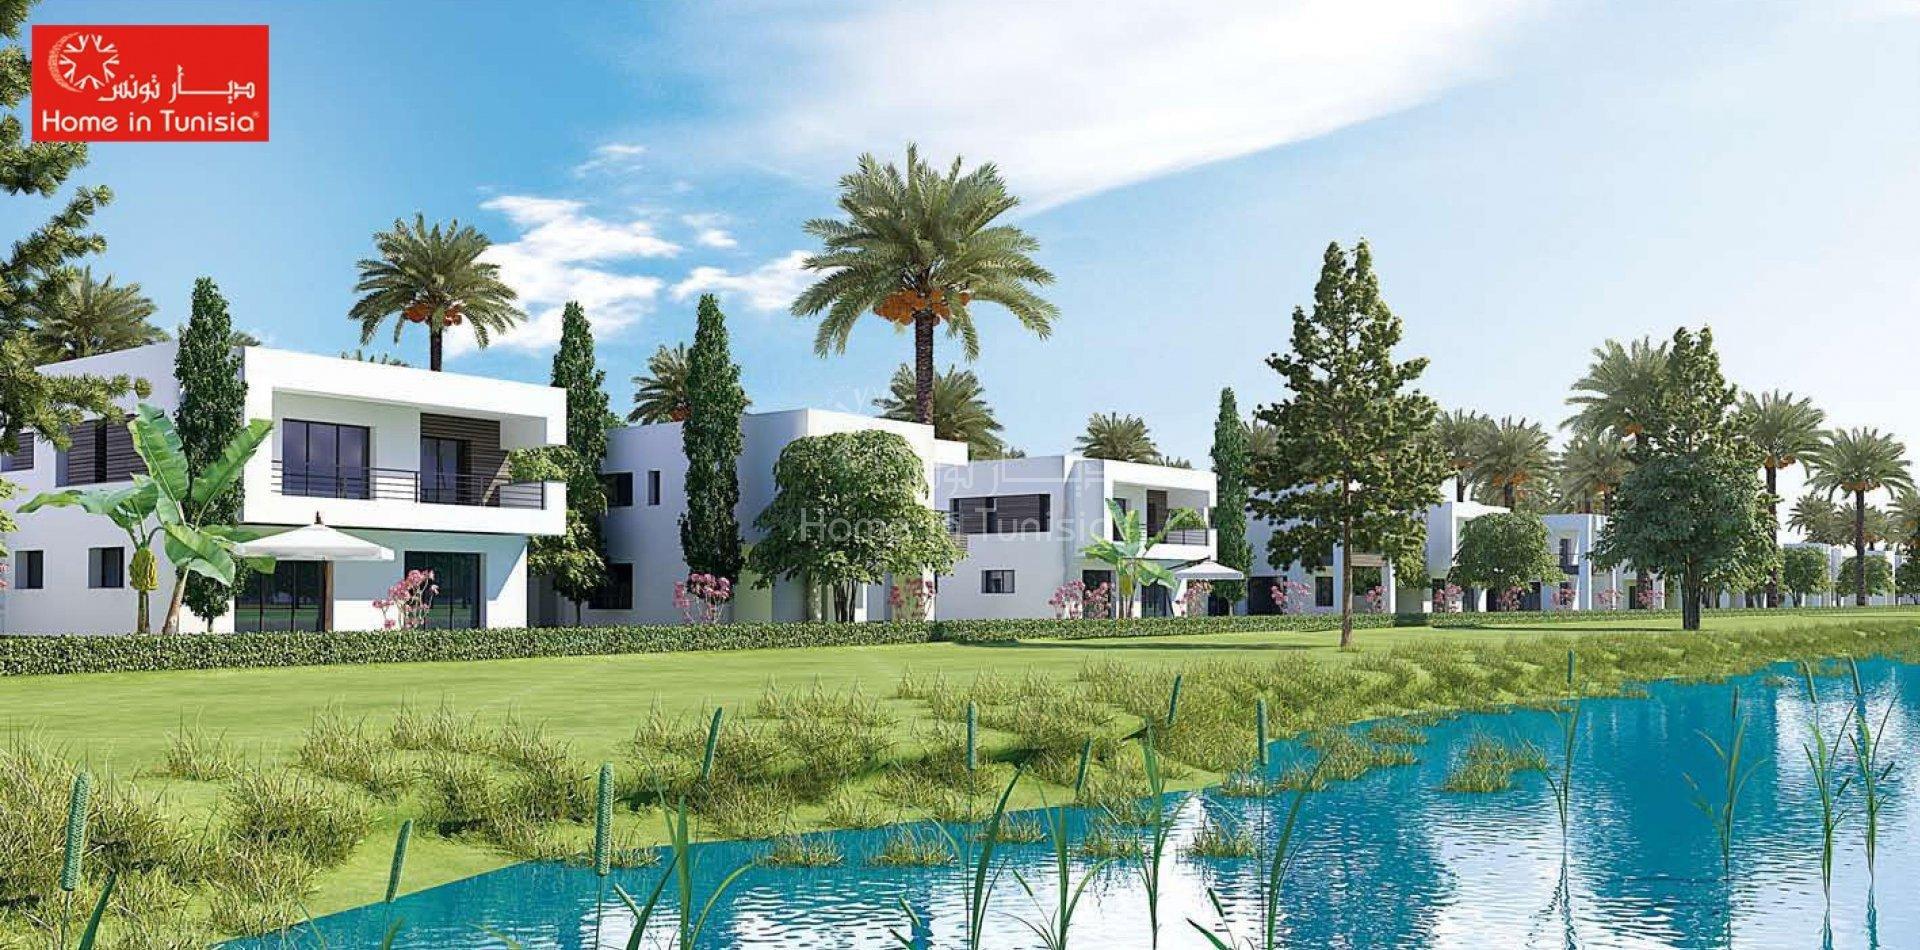 Tunis Bay residential golf villa Oceanos semi-detached 4 bedrooms terrace garden private pool